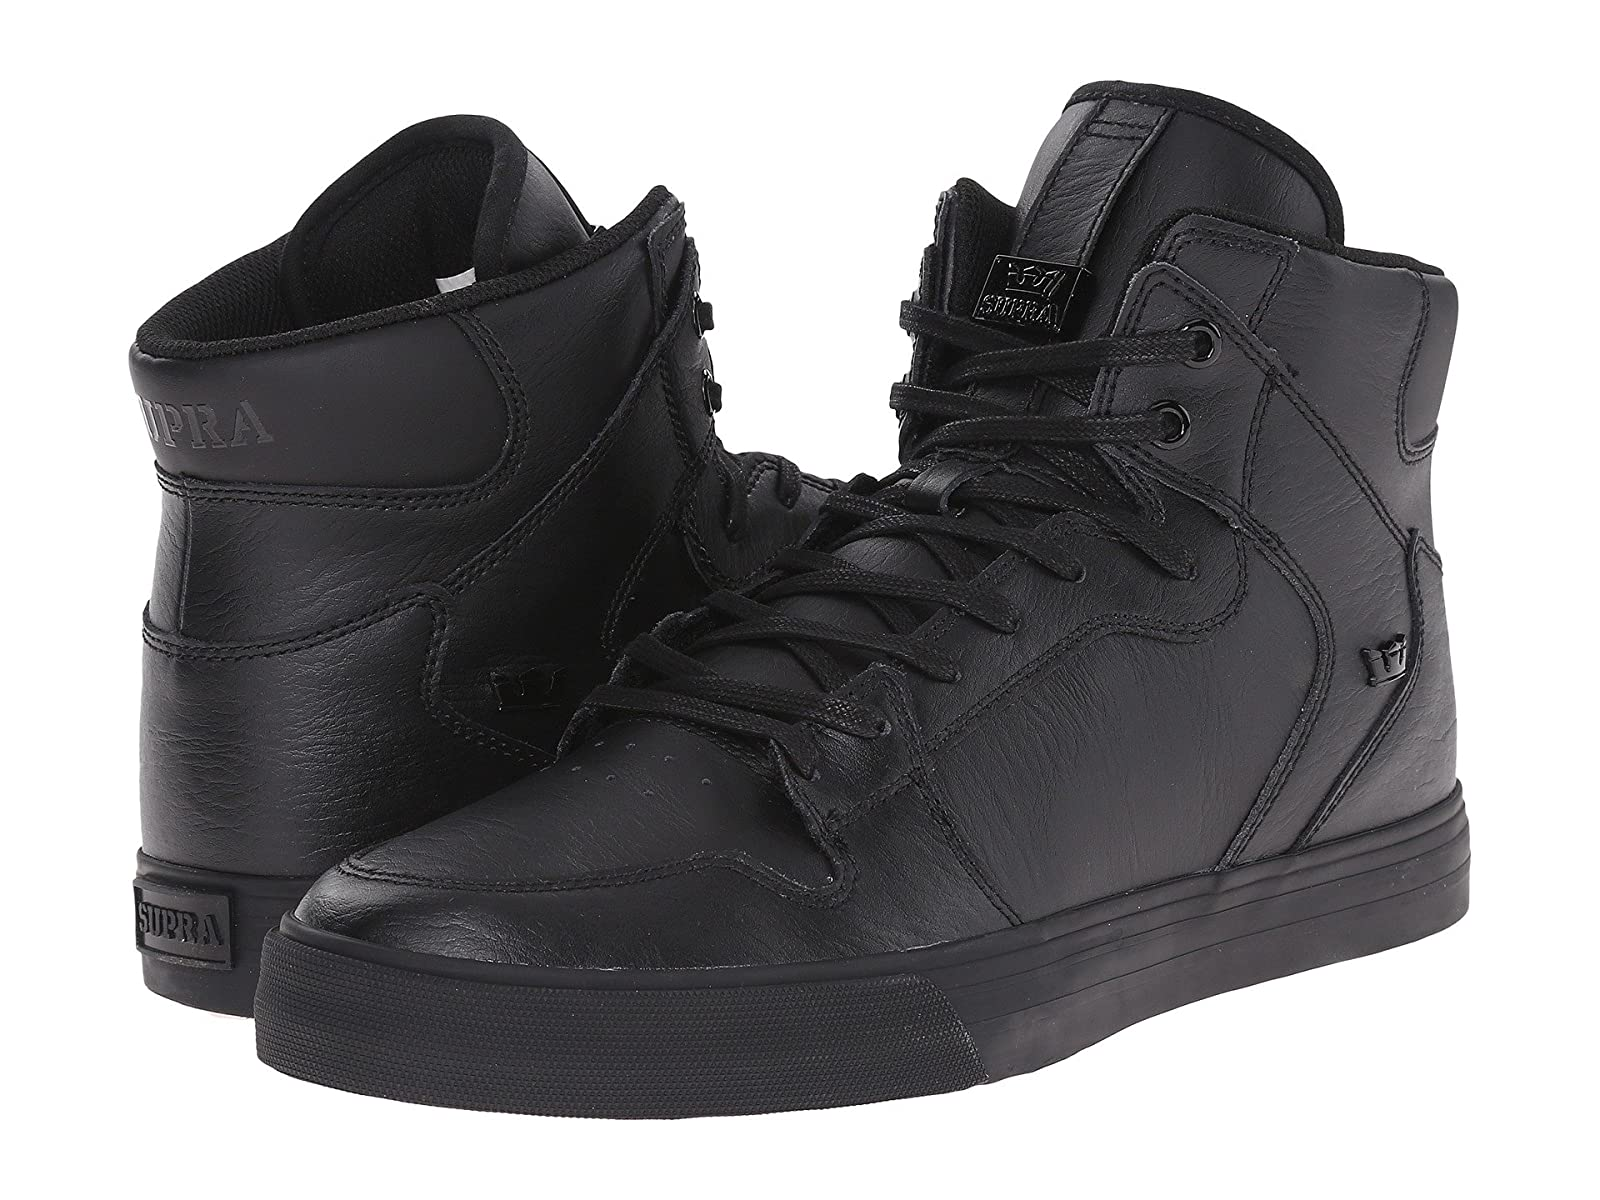 Supra VaiderAtmospheric grades have affordable shoes